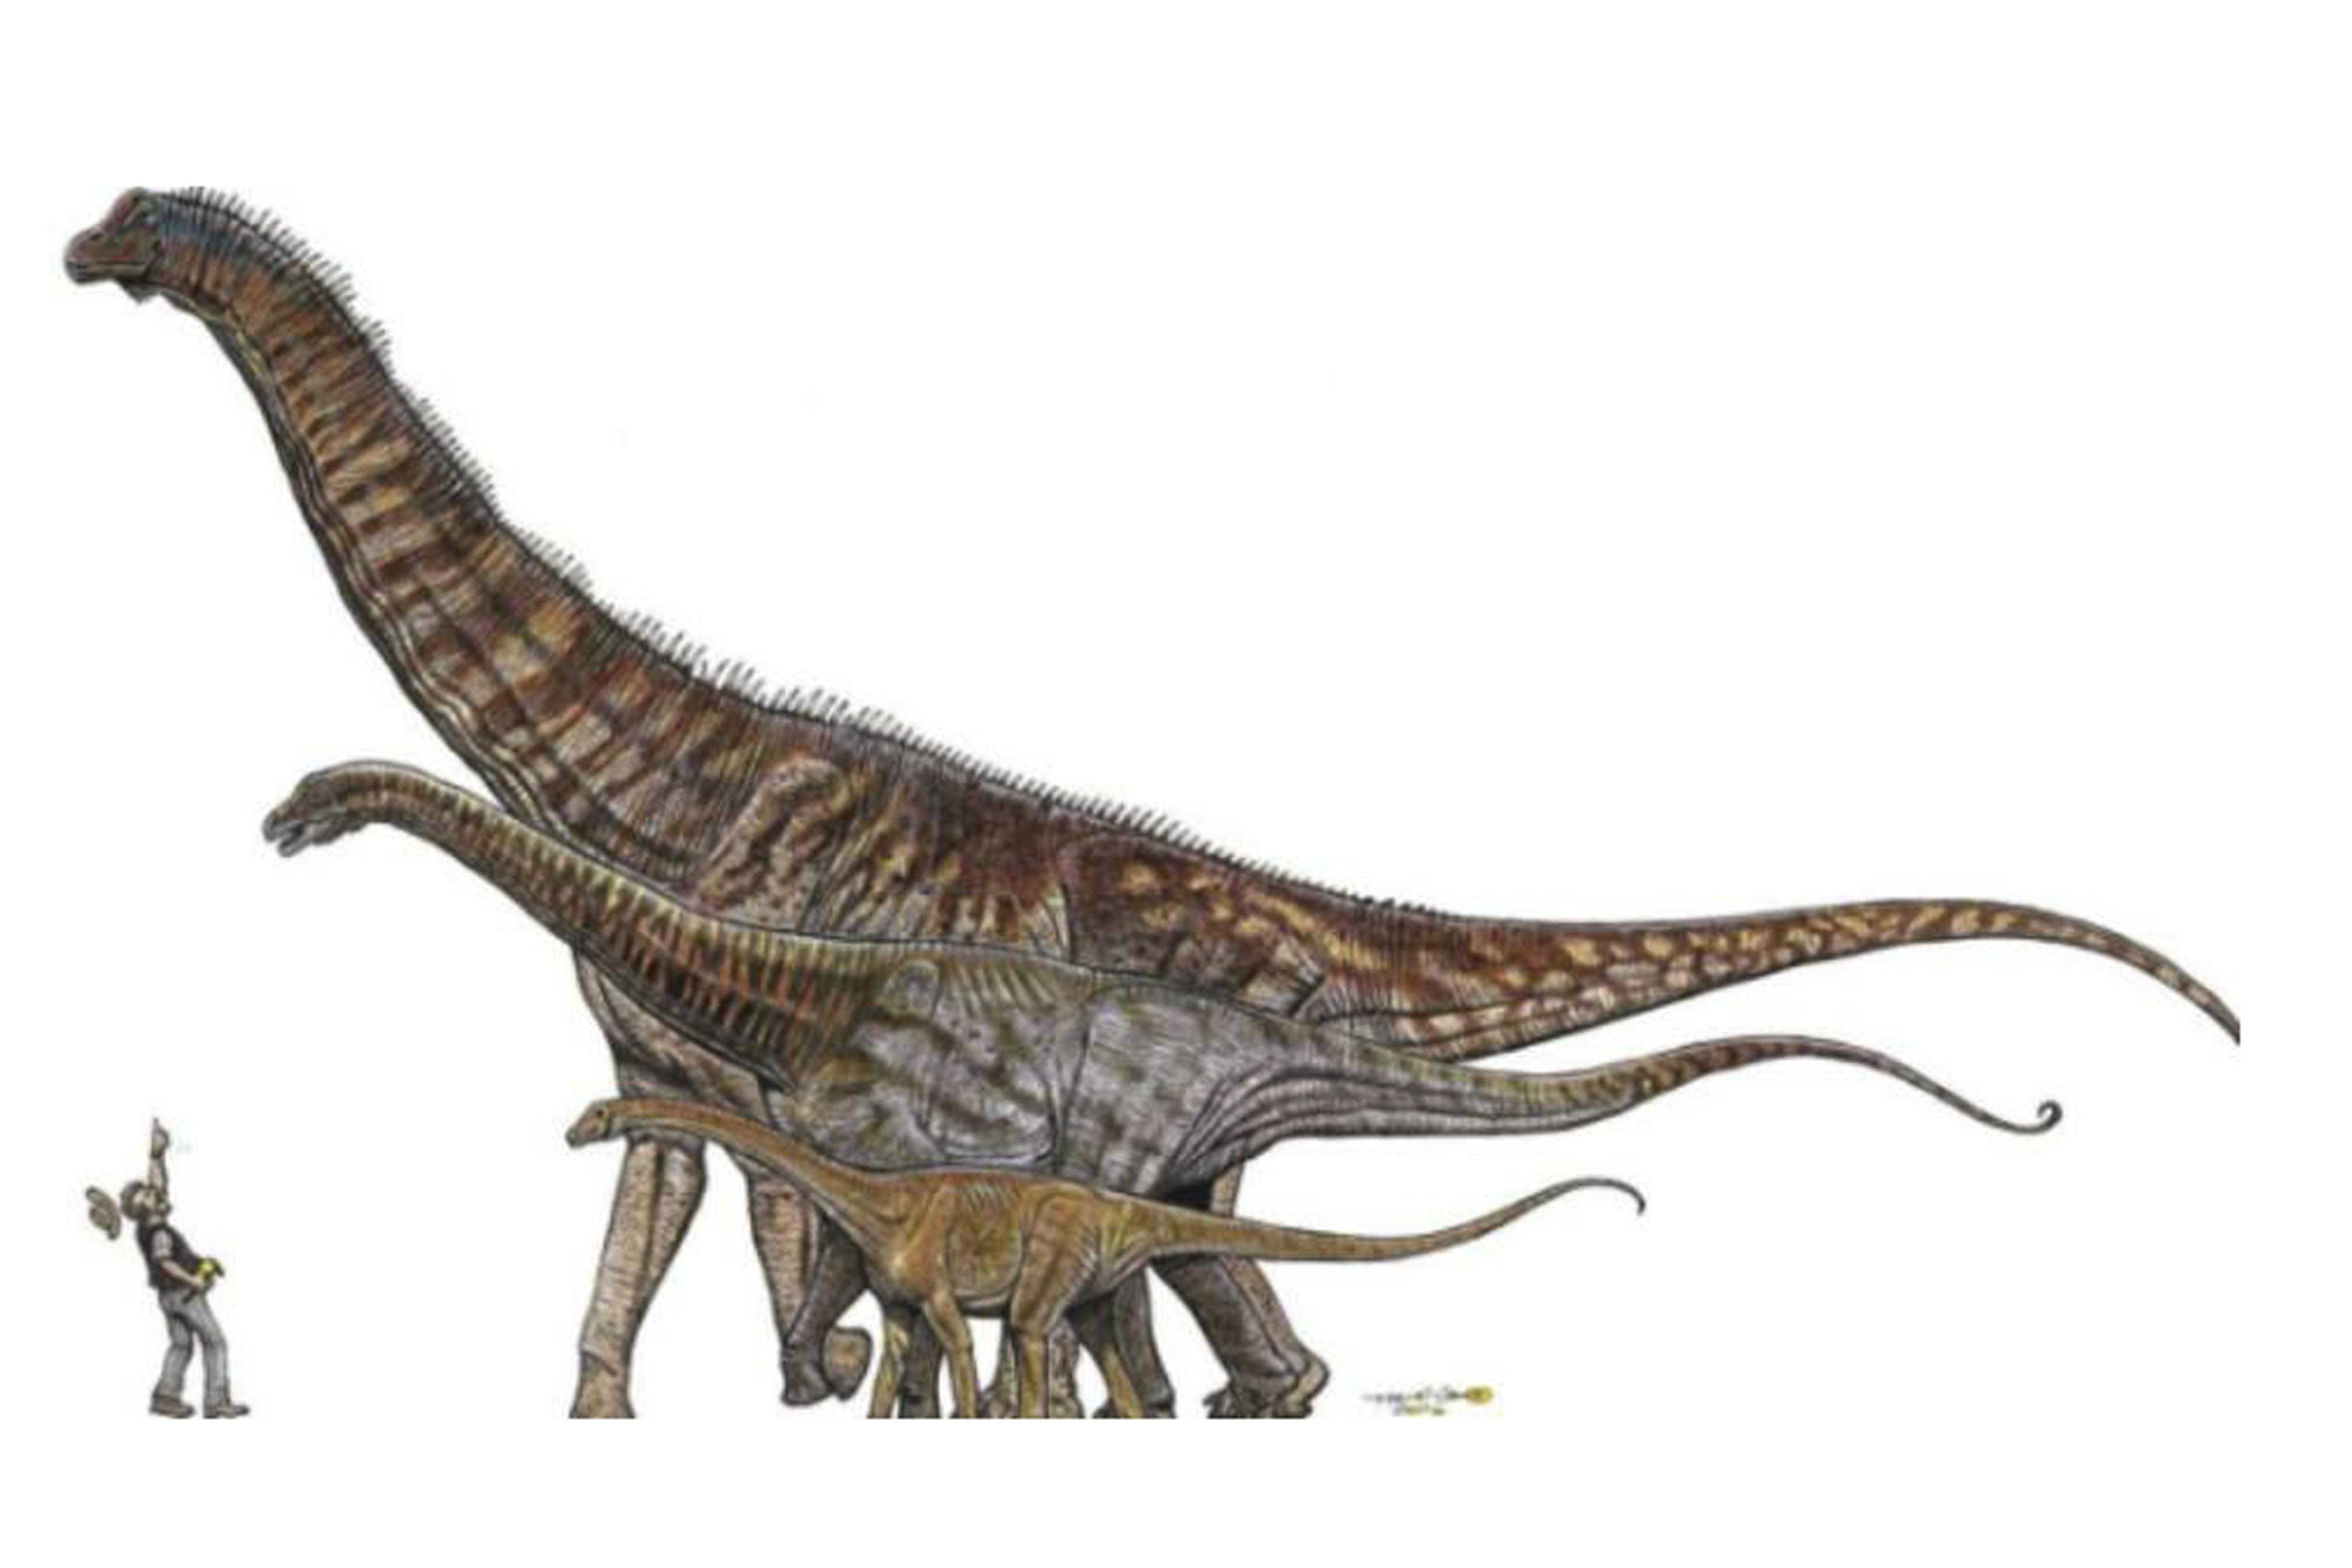 Revelado Fosil Del Dinosaurio Mas Grande De Brasil Agencia Brasil Documental dinosaurios narrado por miguel peñaranda. agencia brasil